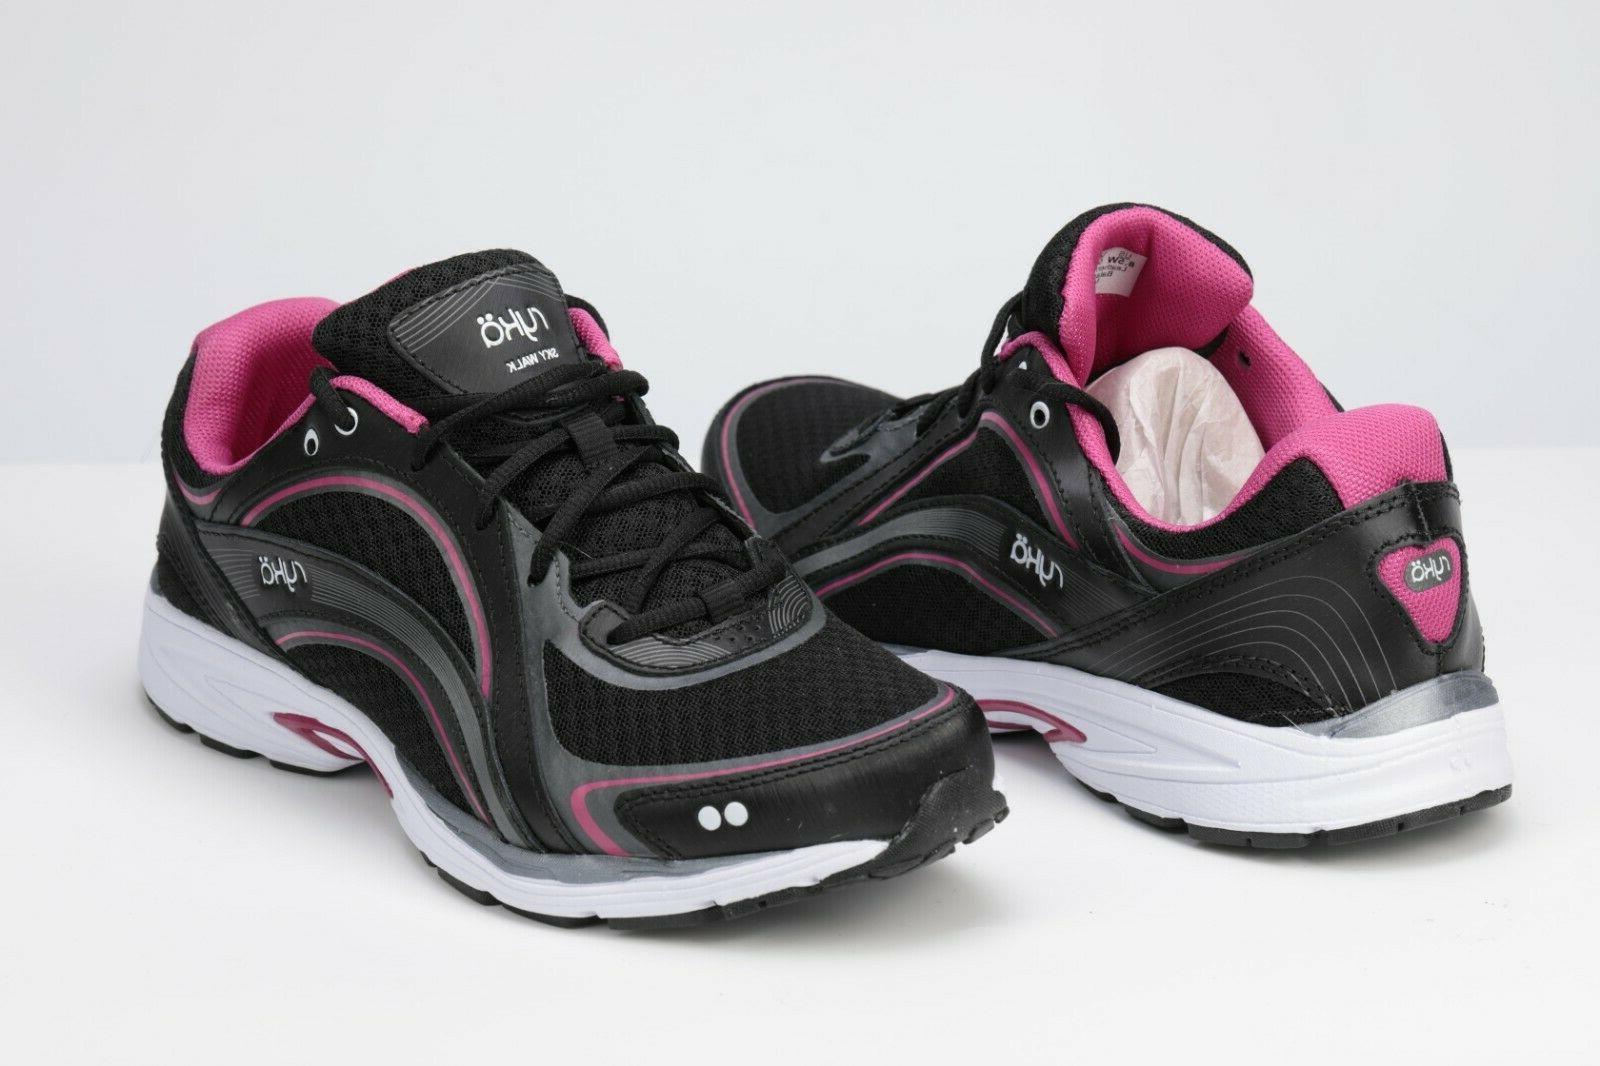 sky walk walking shoe black pink 8